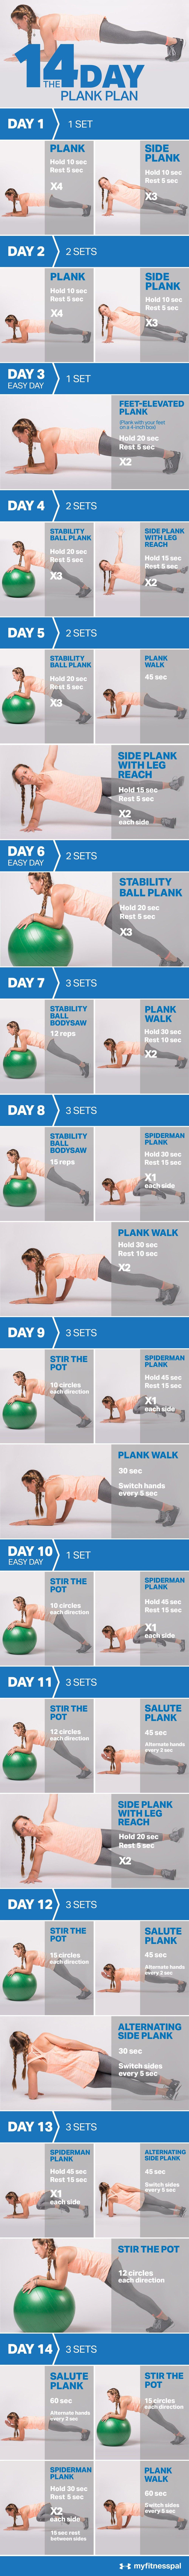 14 Day Plank Plan.jpg